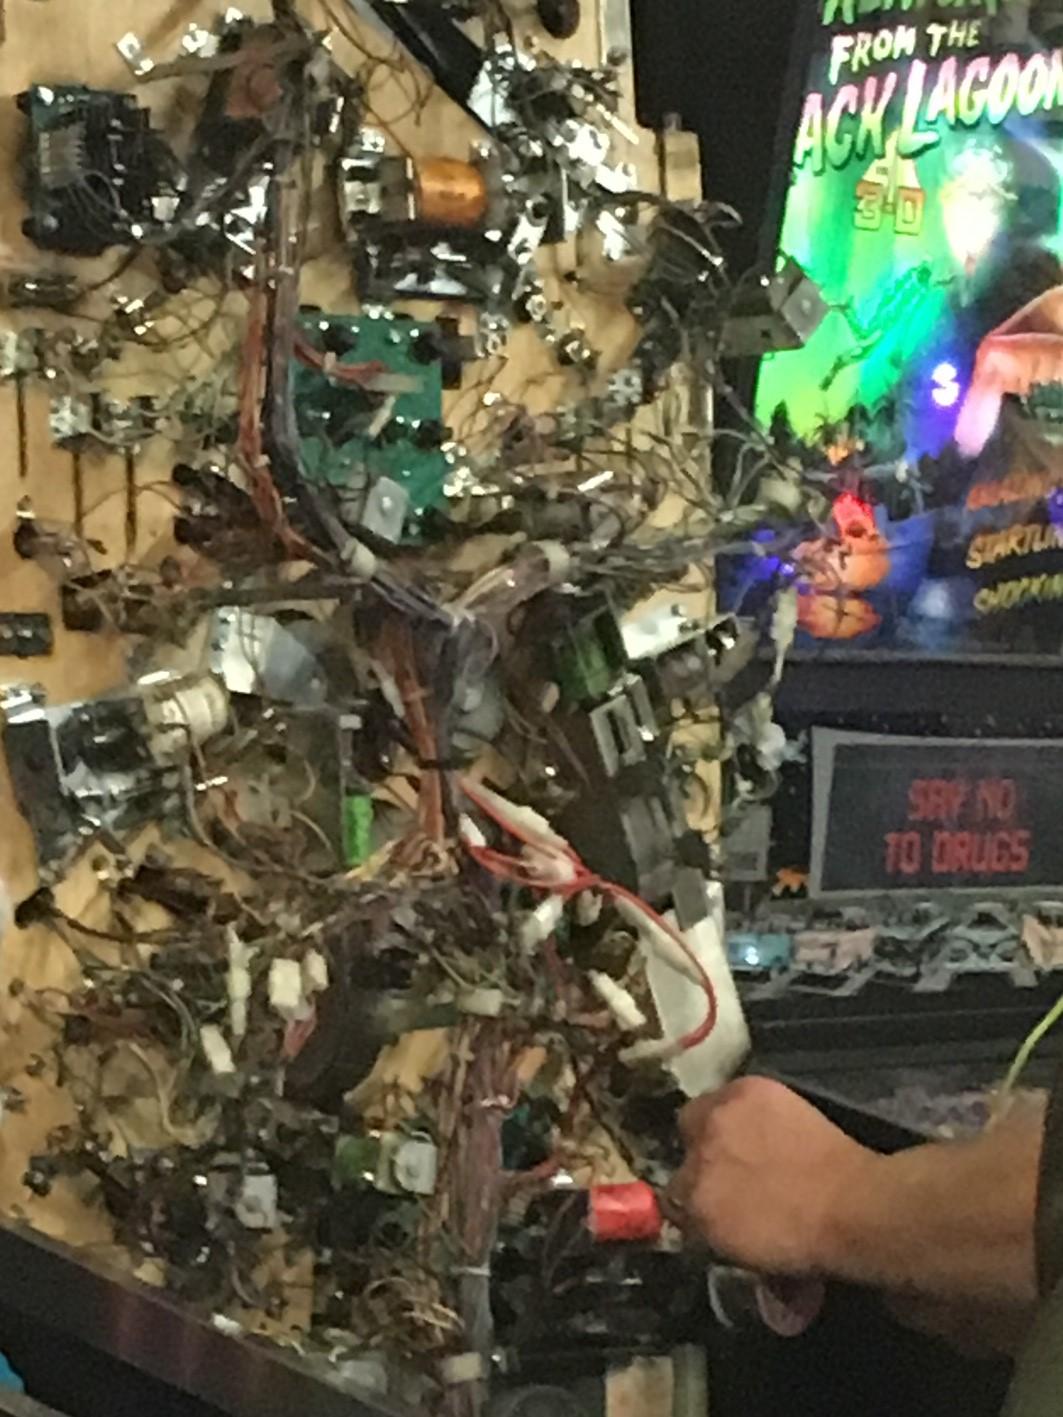 Old-school mechanics of a pinball machine